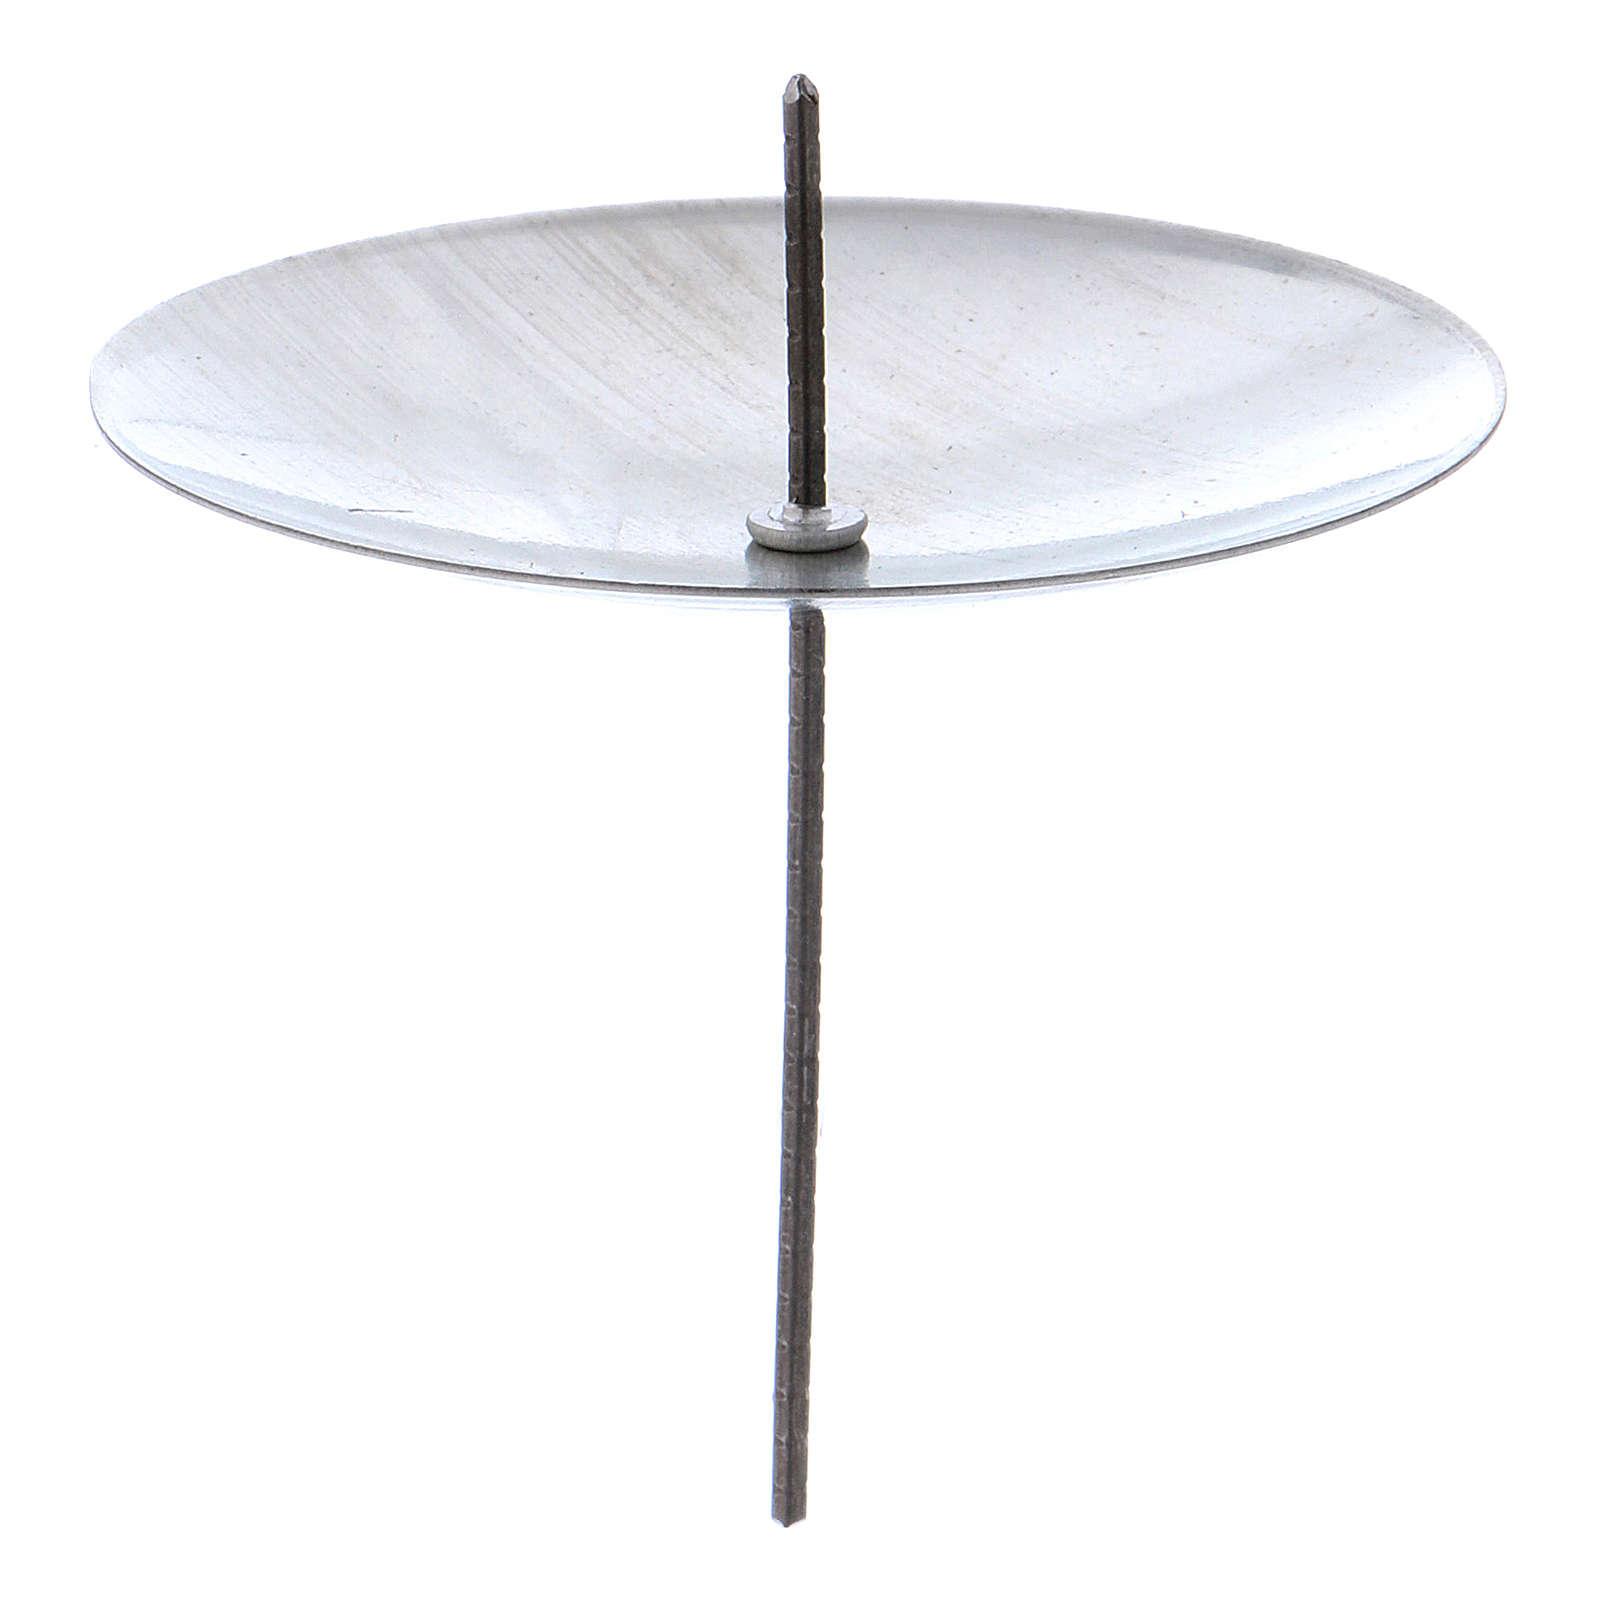 Sostegno candele o cero argento set 4 pz diam 55 mm 3